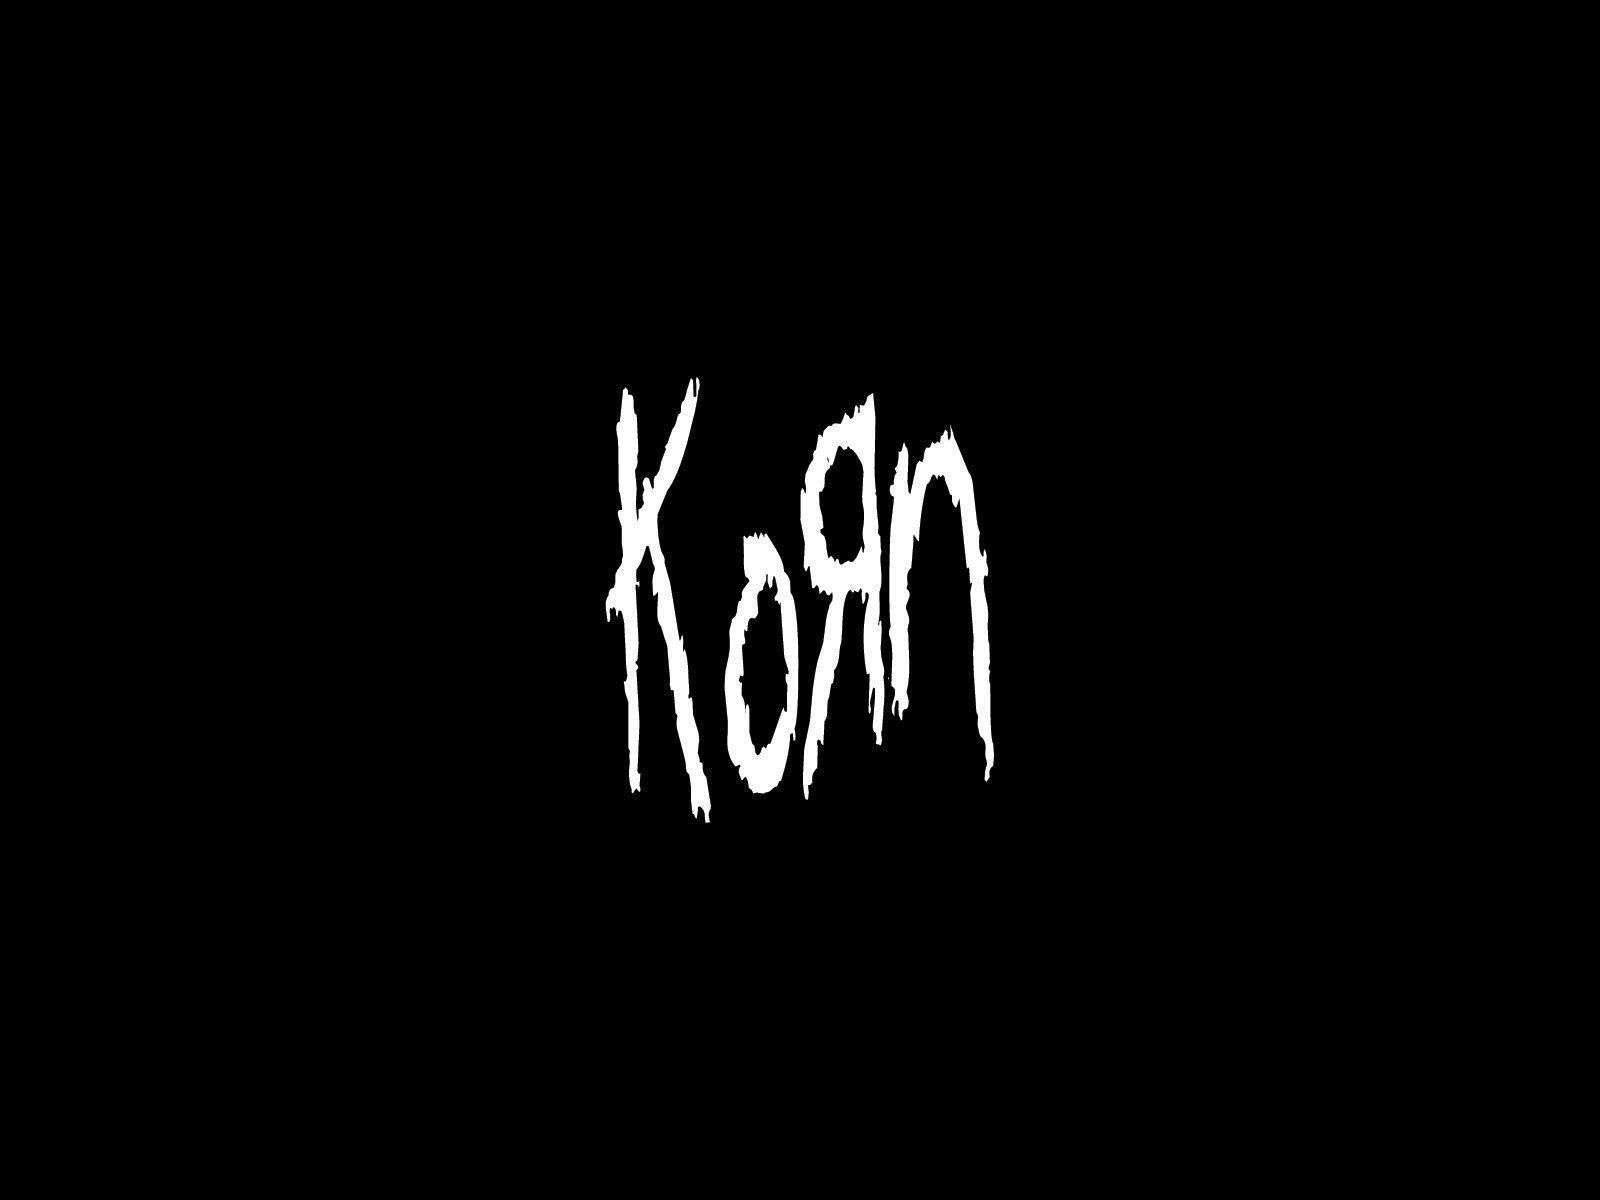 Wallpaper iphone korn - Wallpaper Wallpaper Korn